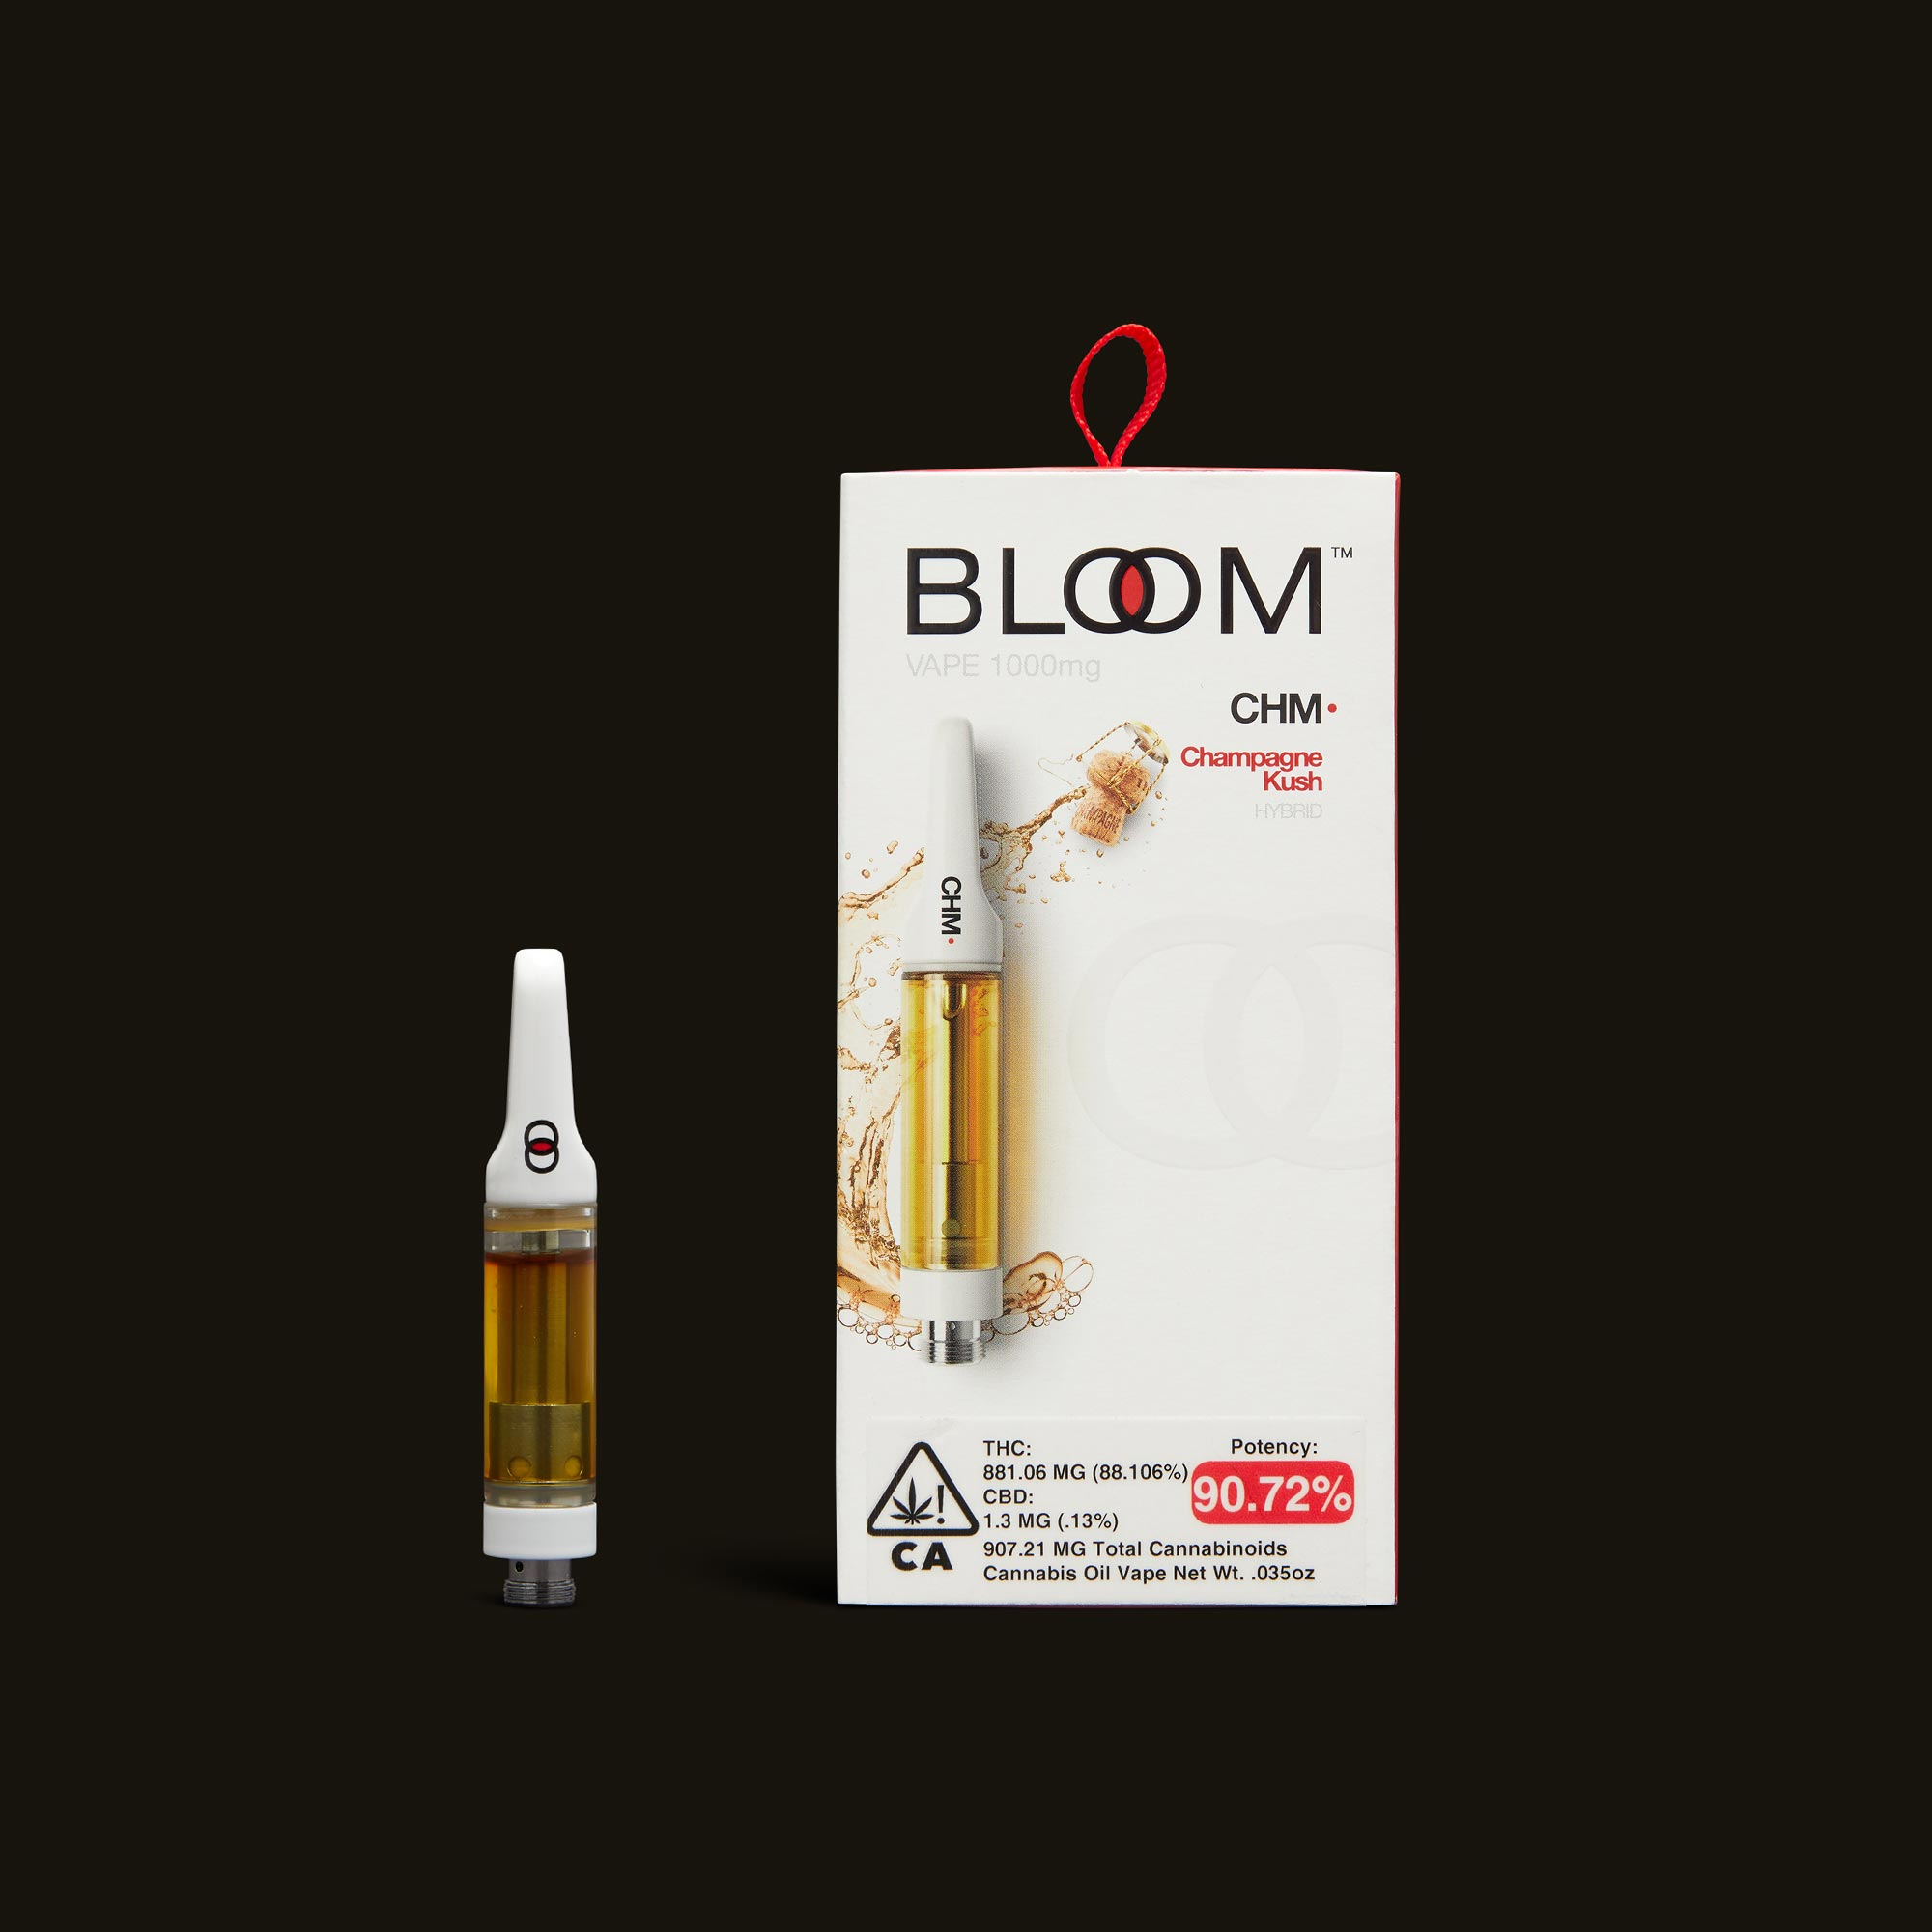 Bloom Brands Champagne Kush Cartridge - 1g